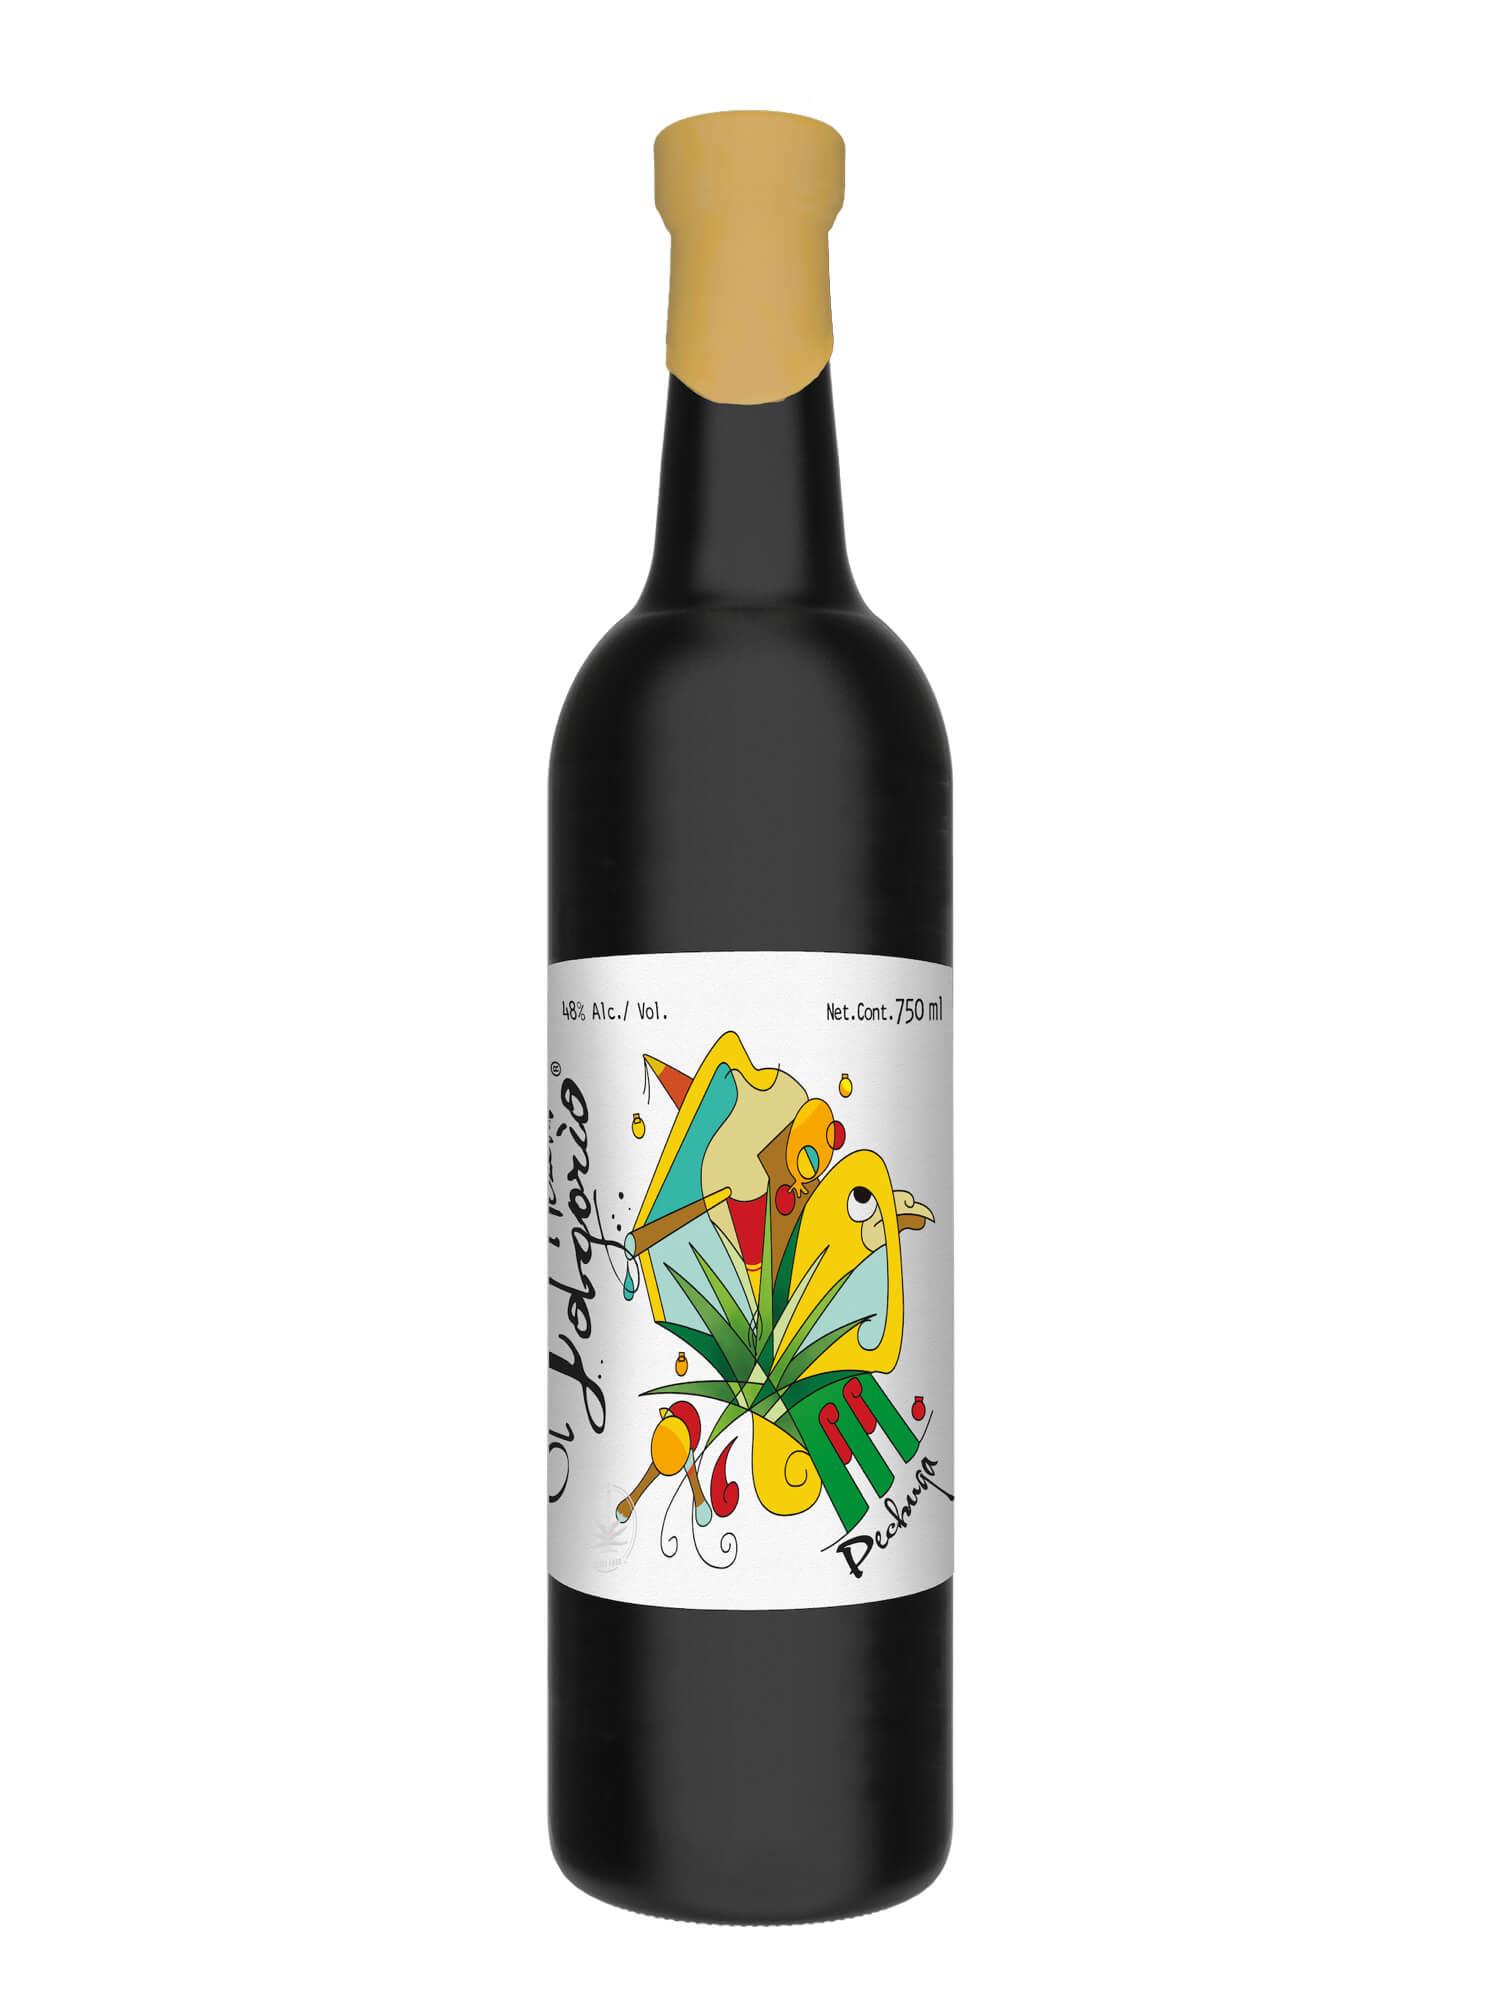 El Jolgorio Pechuga Navideña Mezcal bottle